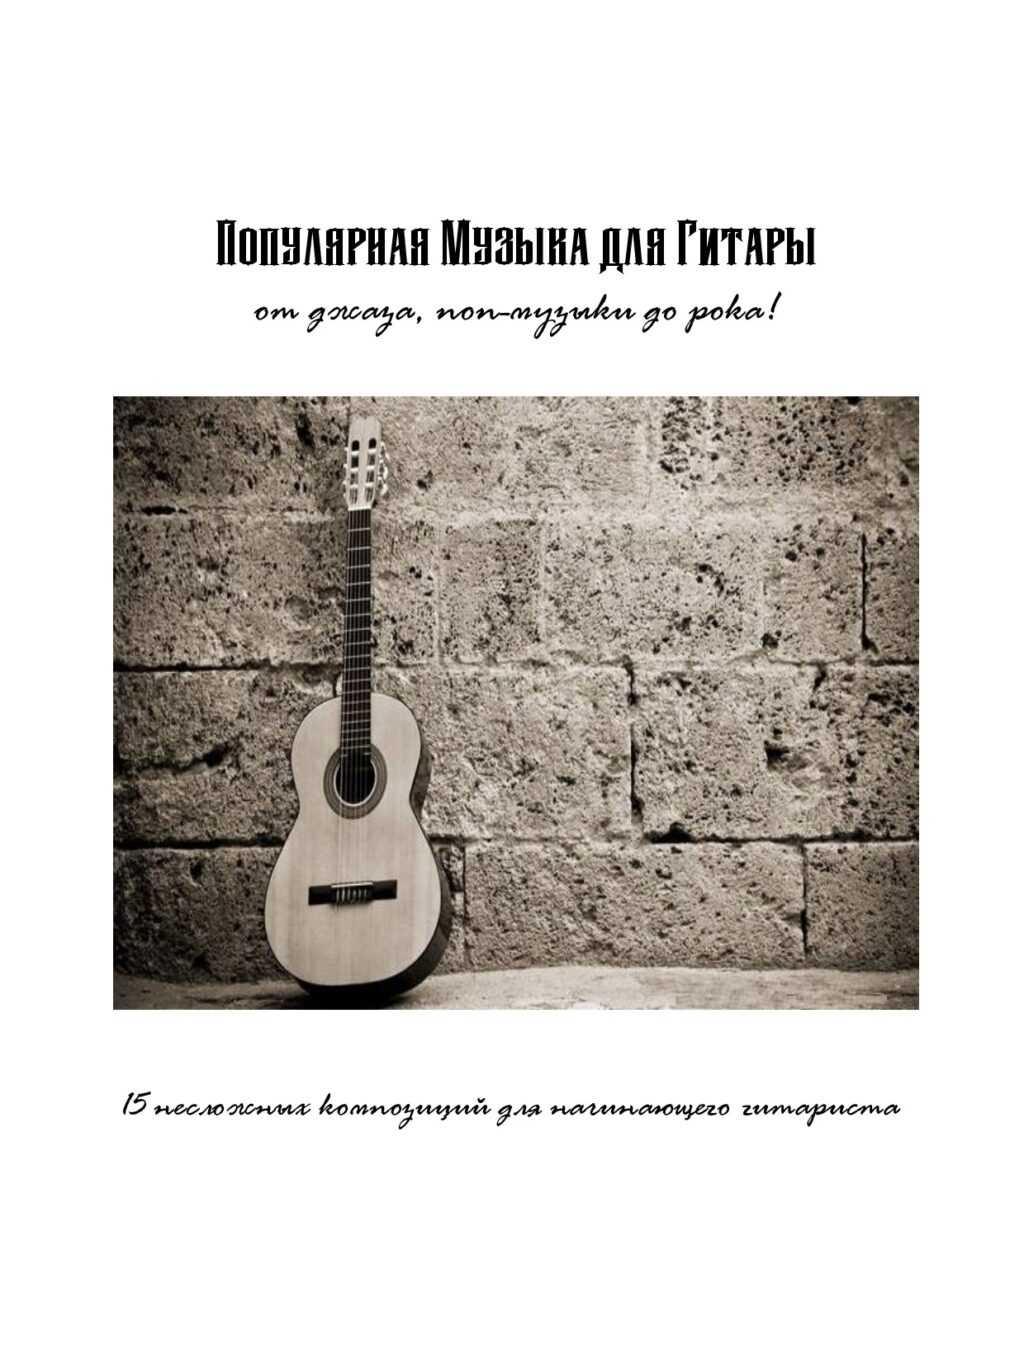 Популярная Музыка для Гитары от джаза, поп-музыки до рока. Ладыгин А.